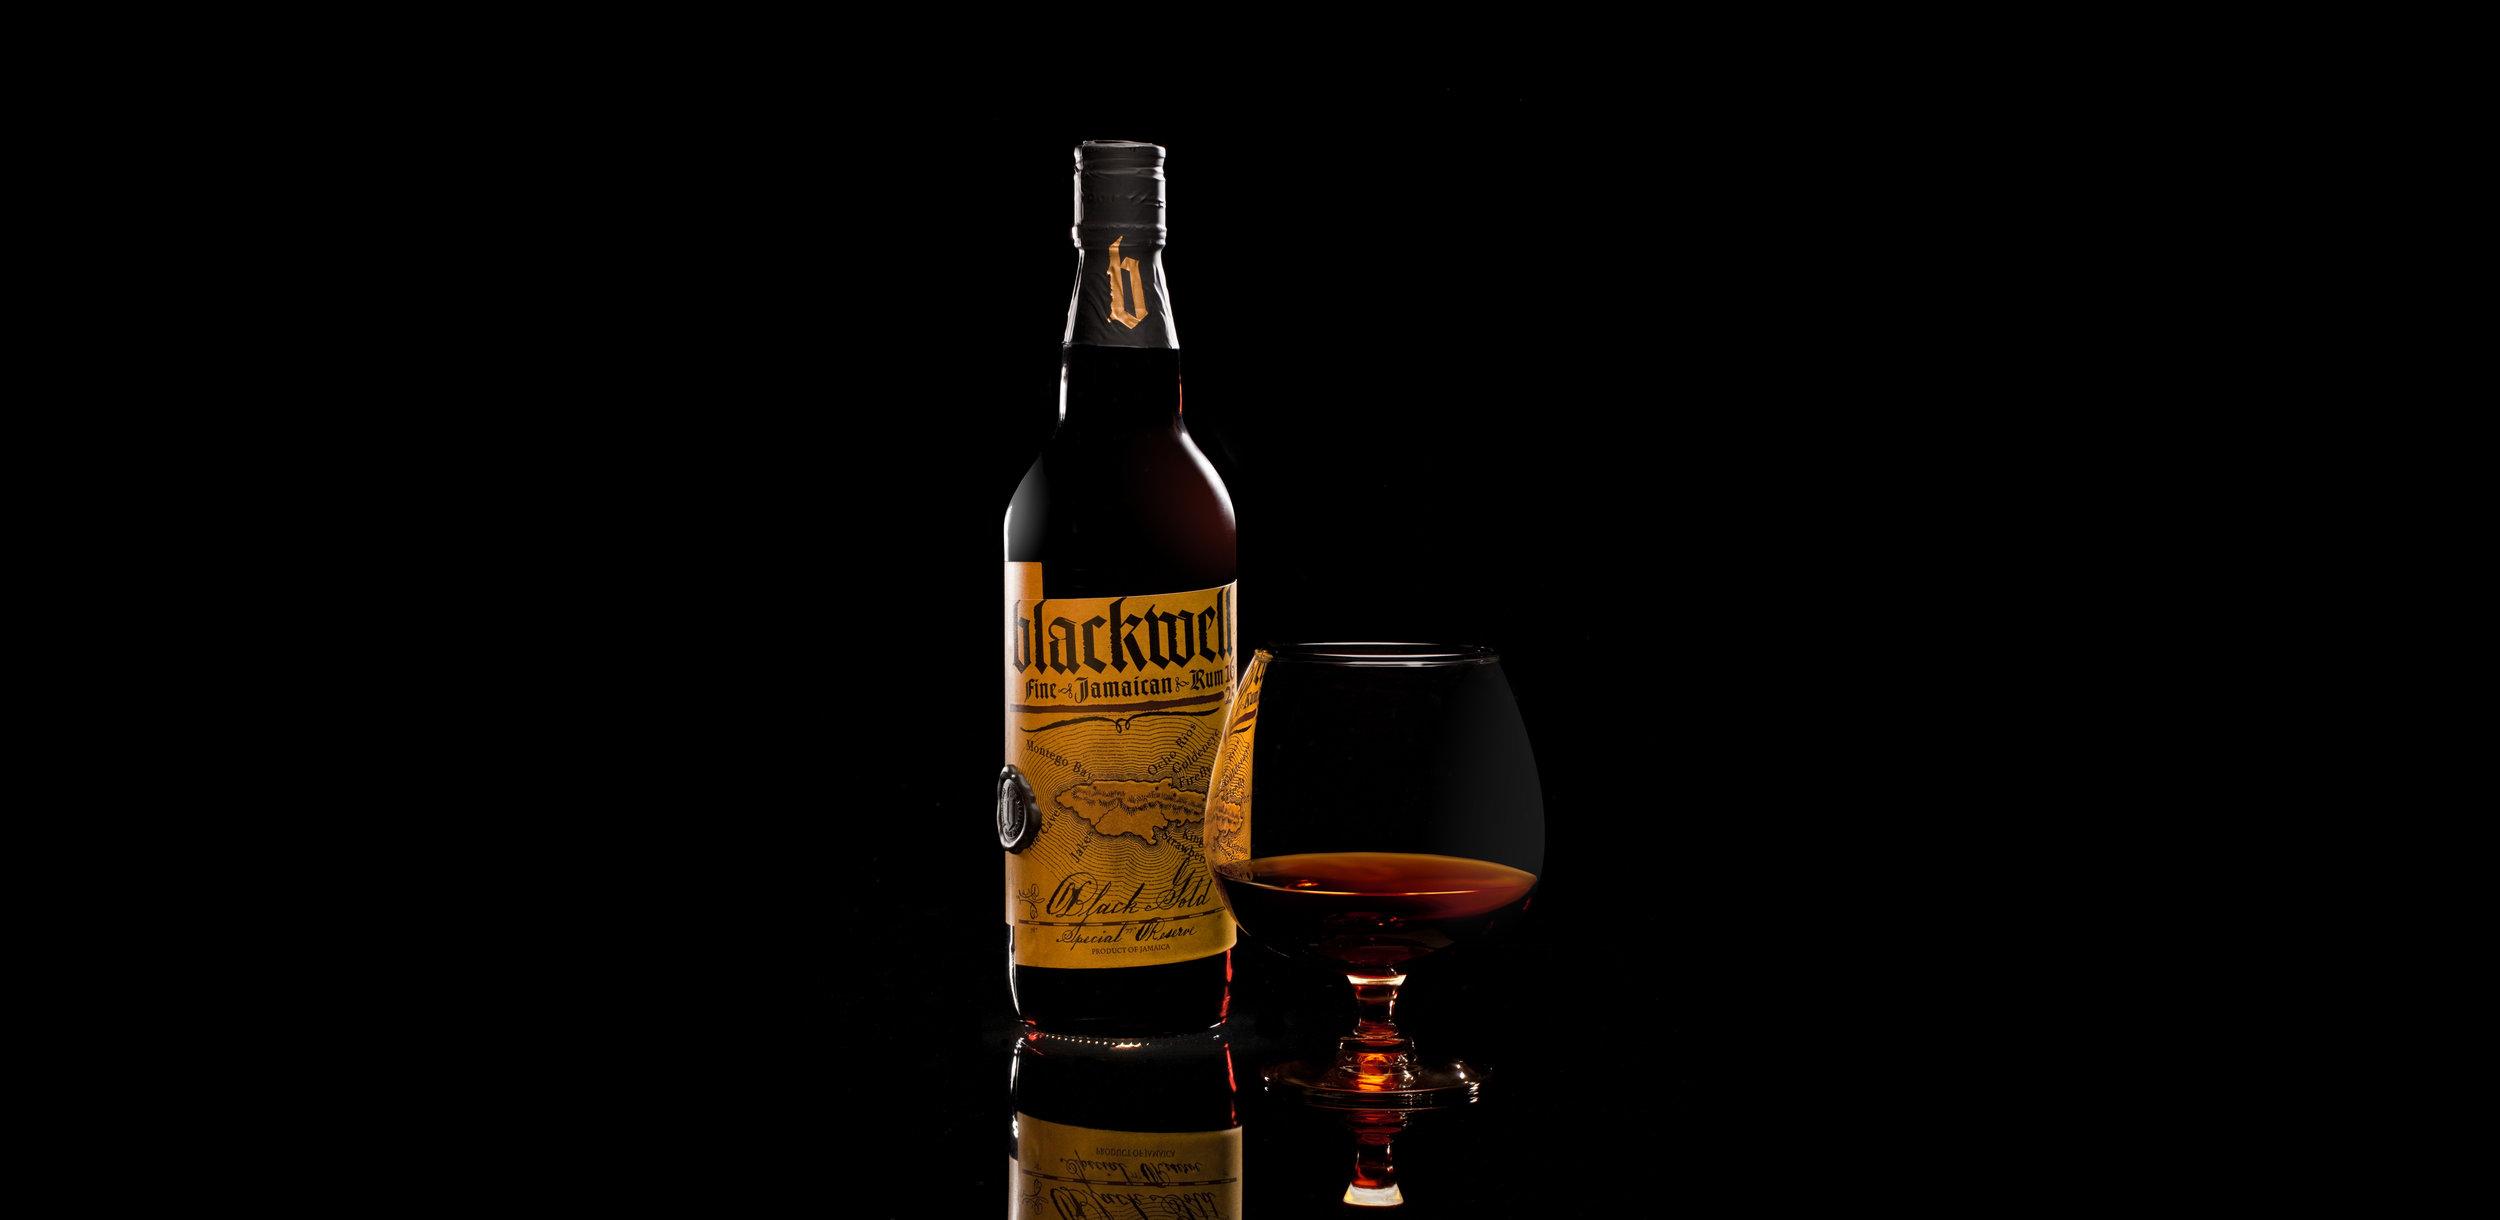 58e809c713282314b533664b_58d137736767c68d776e129d_Blackwell Rum Bottle.jpg